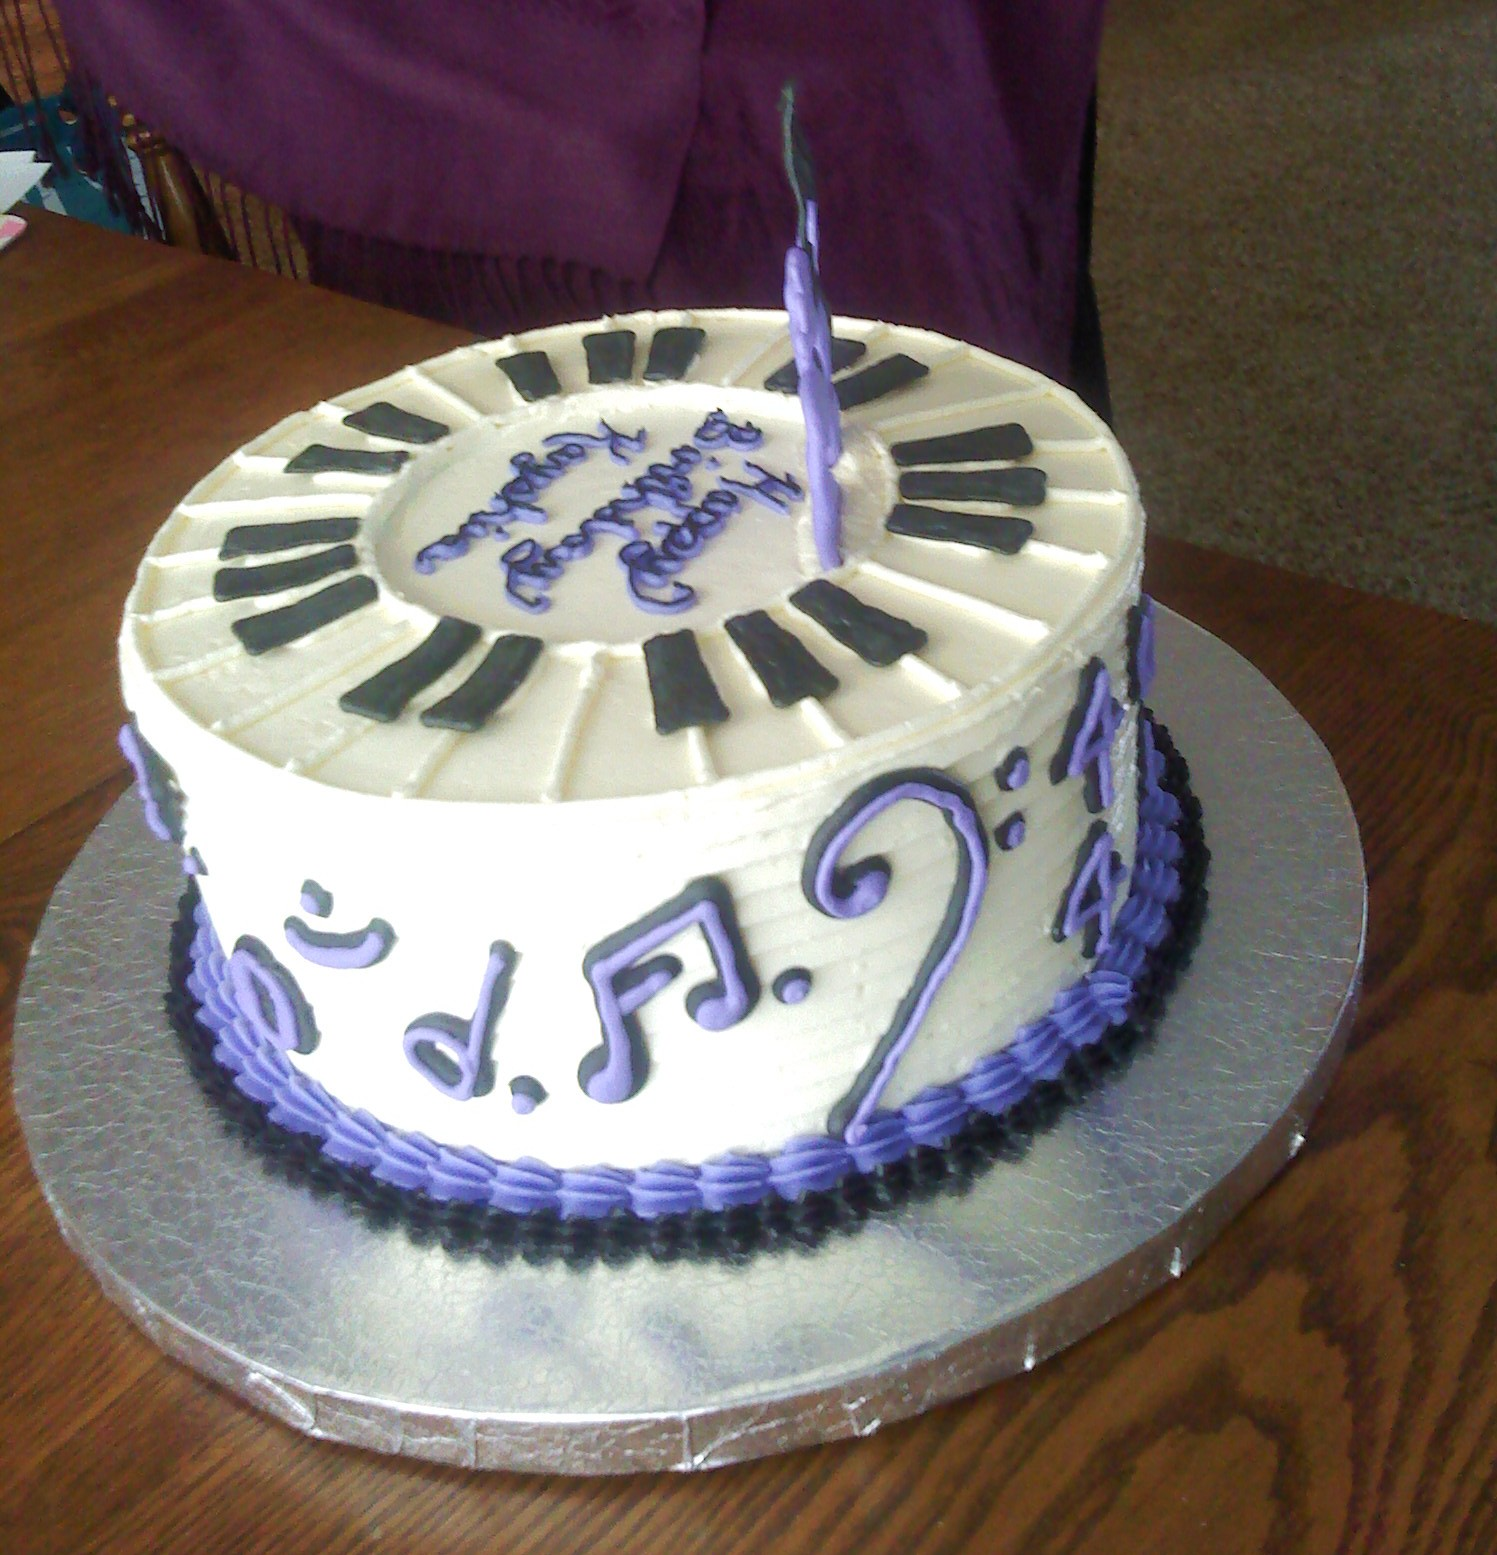 Blue Bandana Birthday Cake Image Inspiration of Cake and Birthday